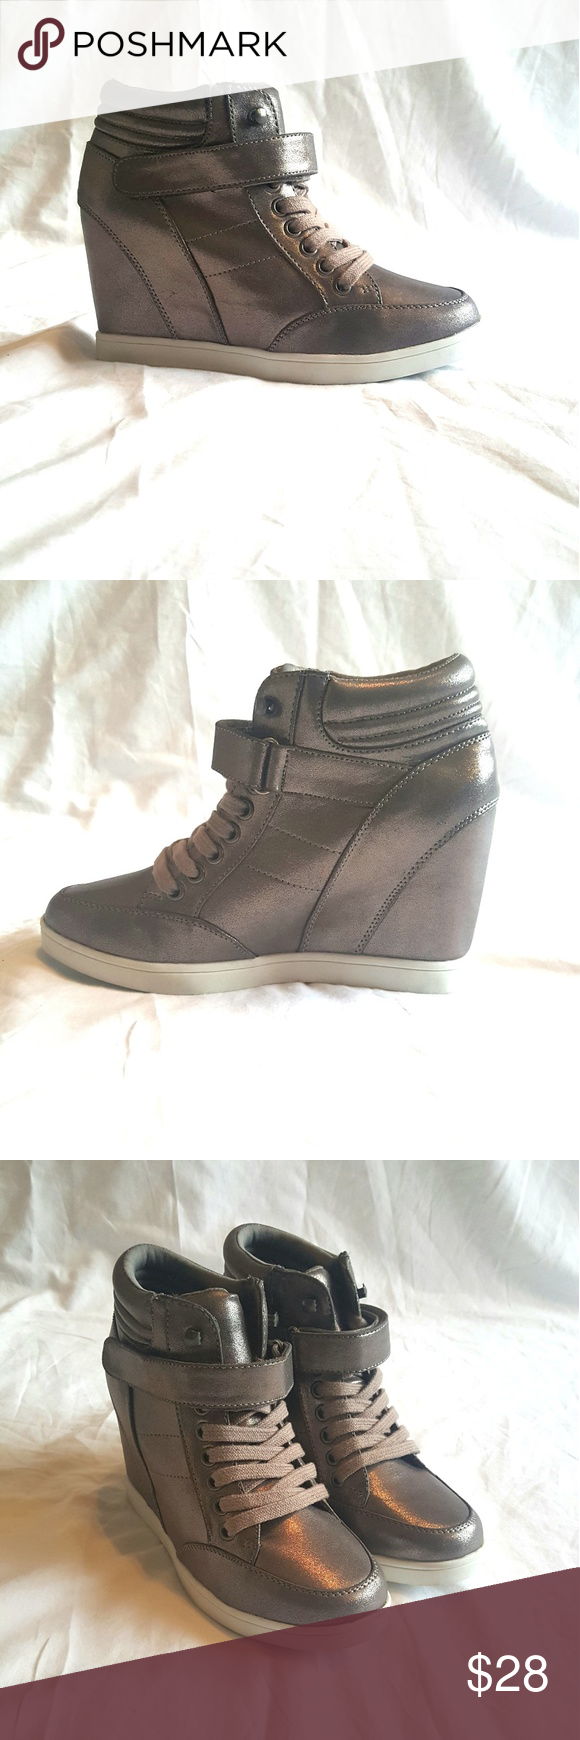 d3fd27f7d0b Madden Girl Finkyy Wedge Sneakers Brand New